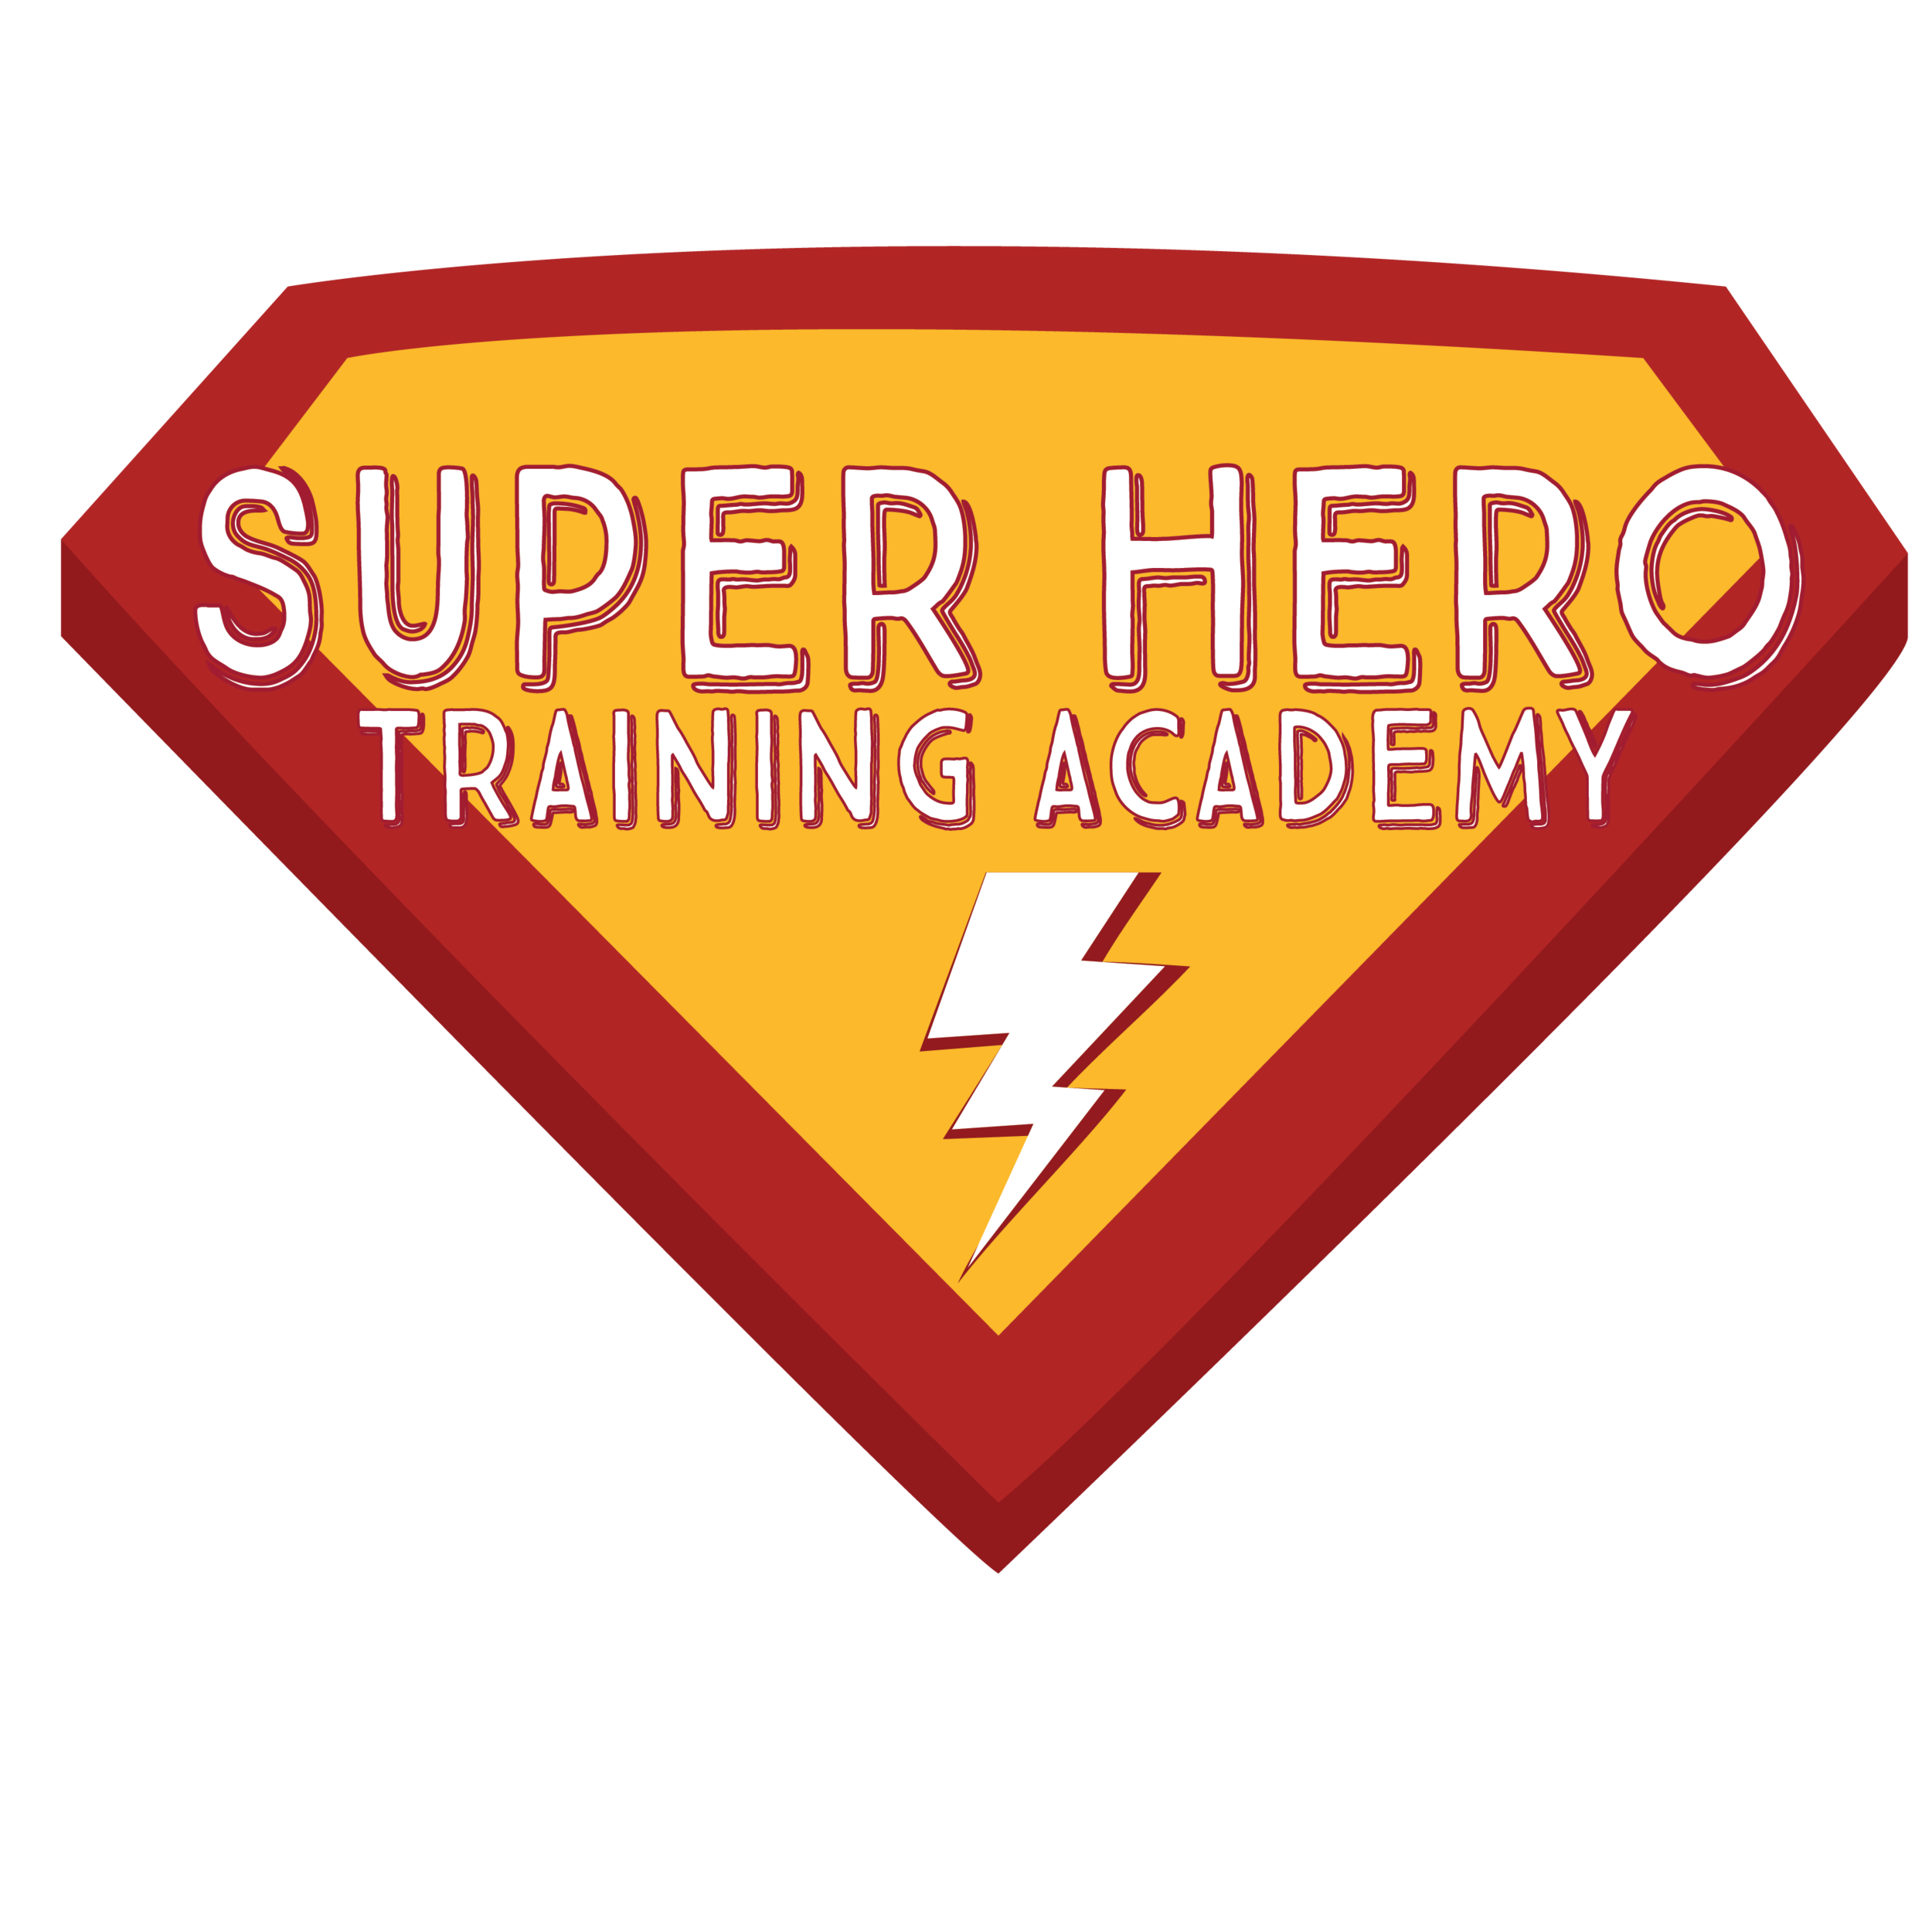 SUPER HERO TRAINING ACADEMY LOGO Final-01.png